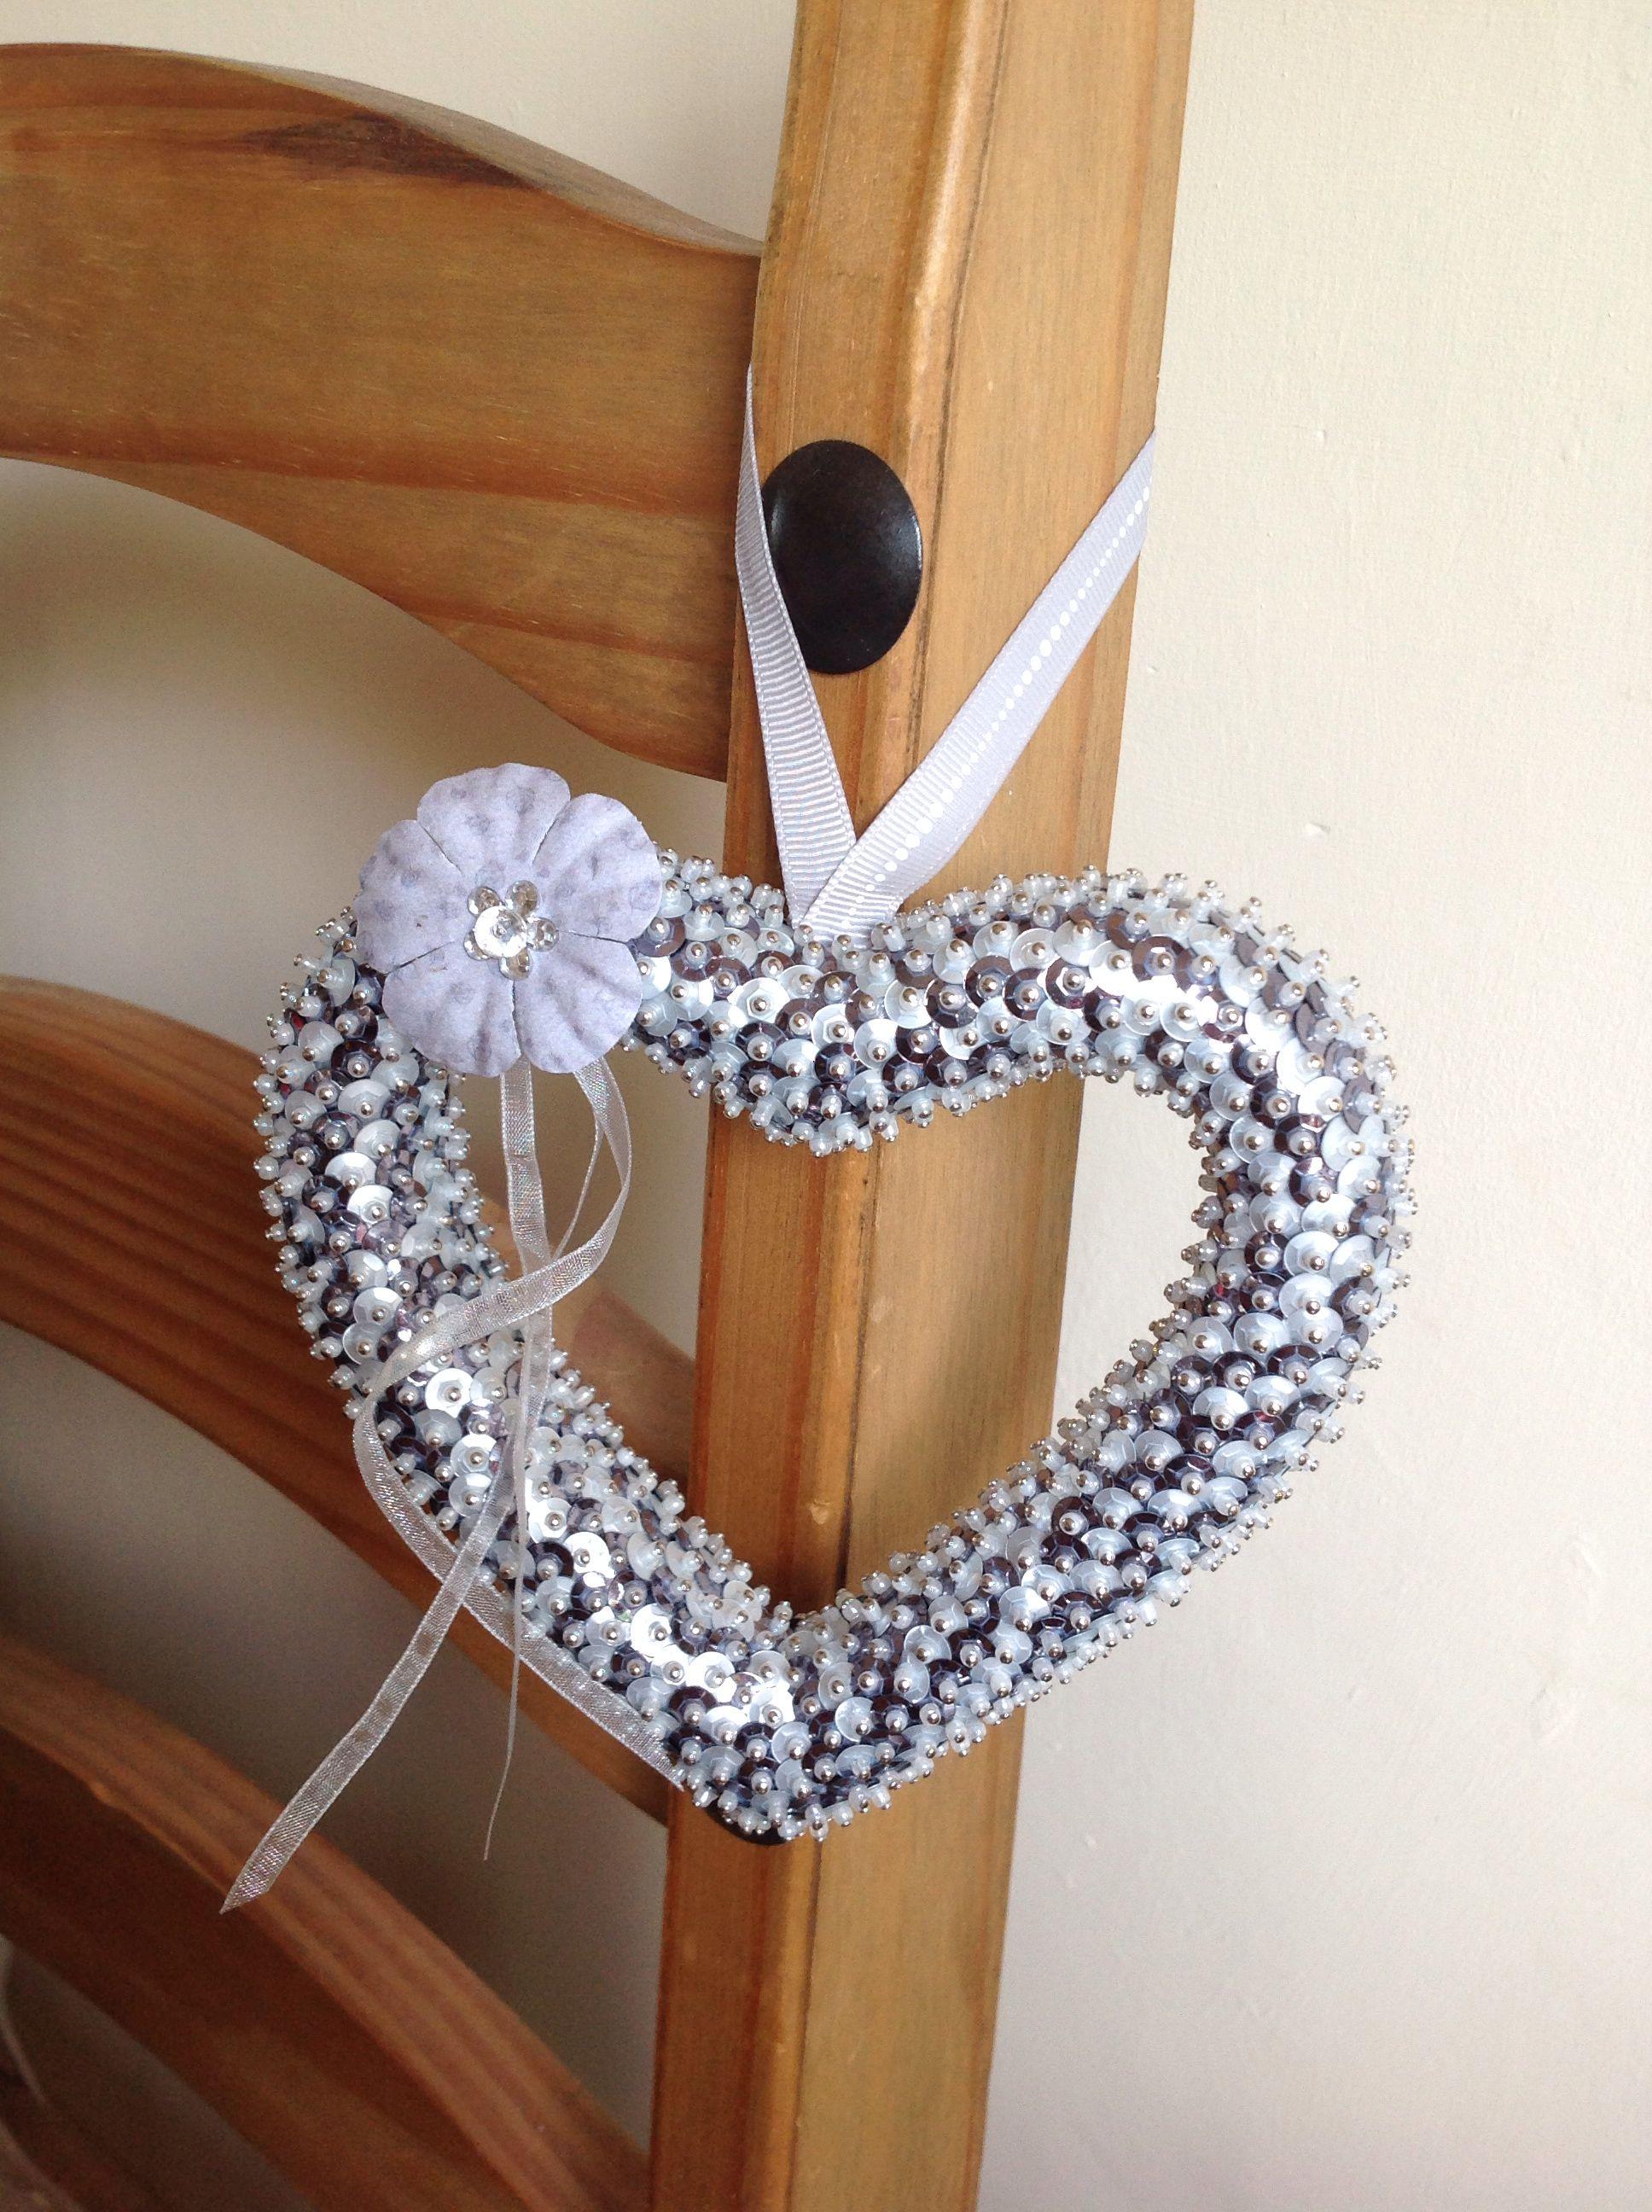 Handmade sequin heart with embellishment.